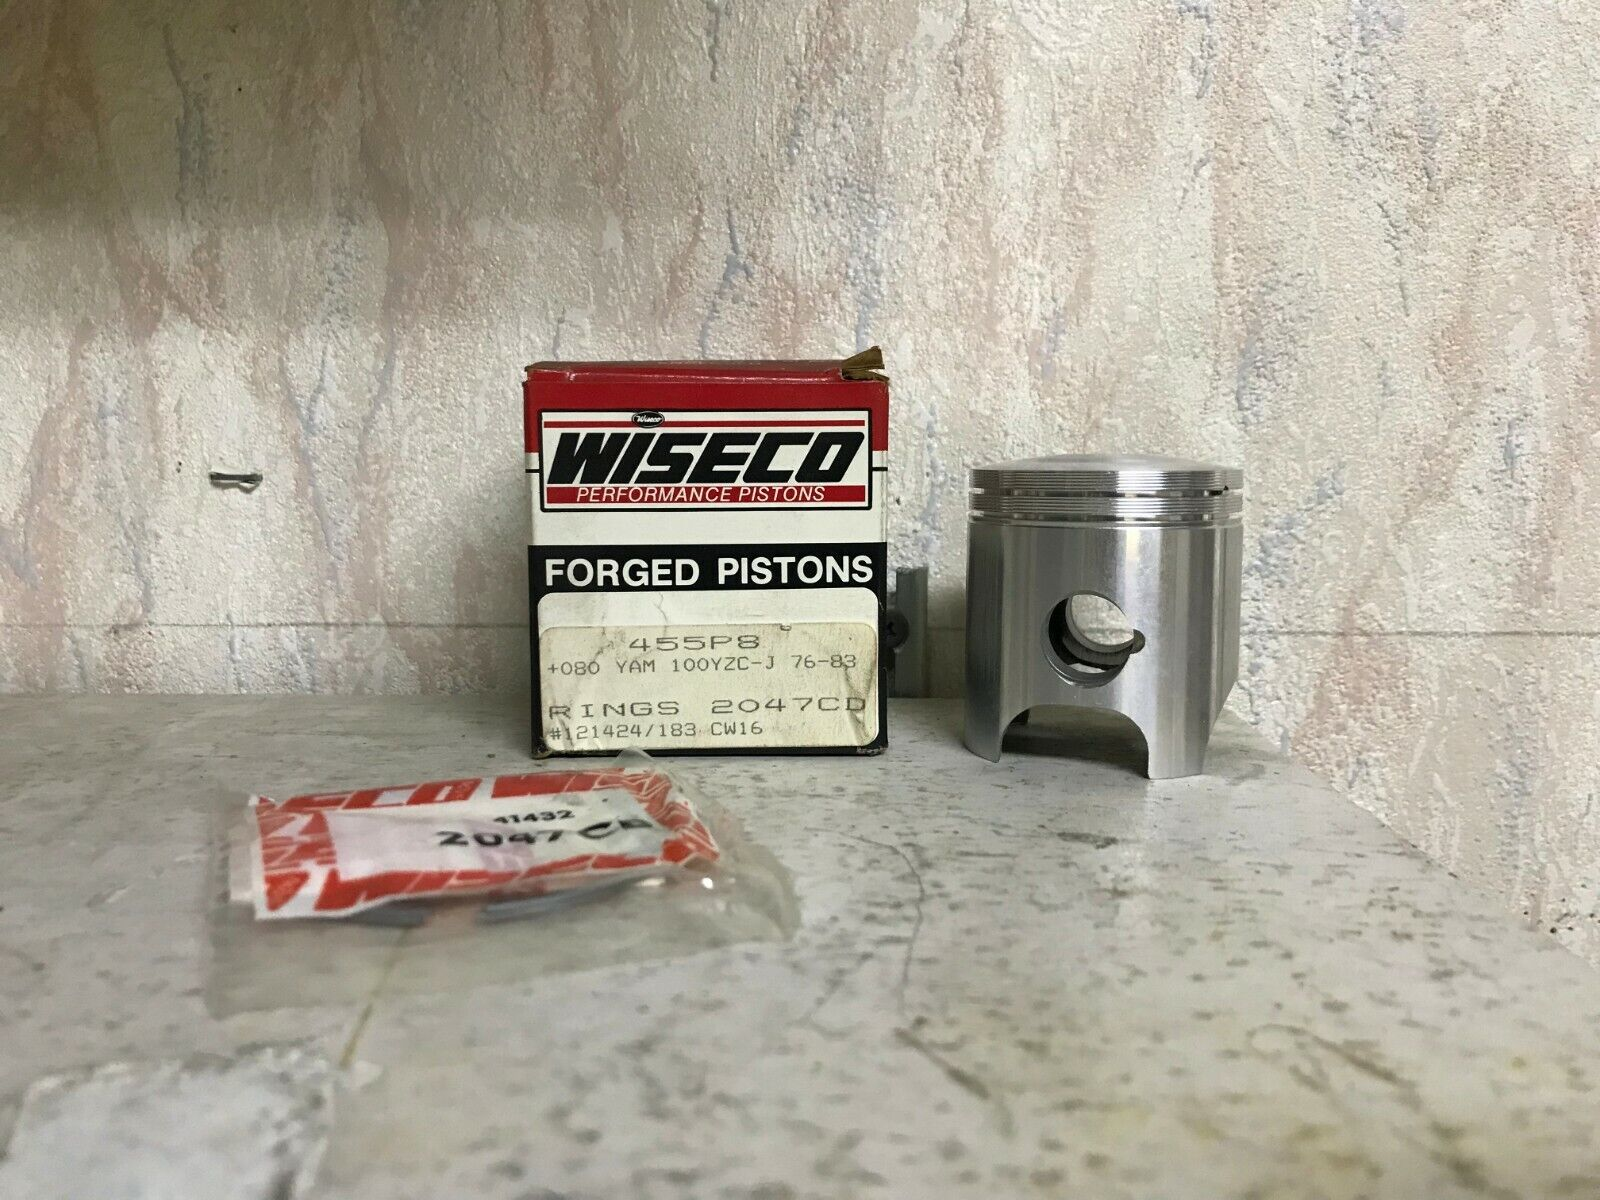 Wiseco Piston 455P8 Yamaha 100YZC-J 1976-83 Vintage